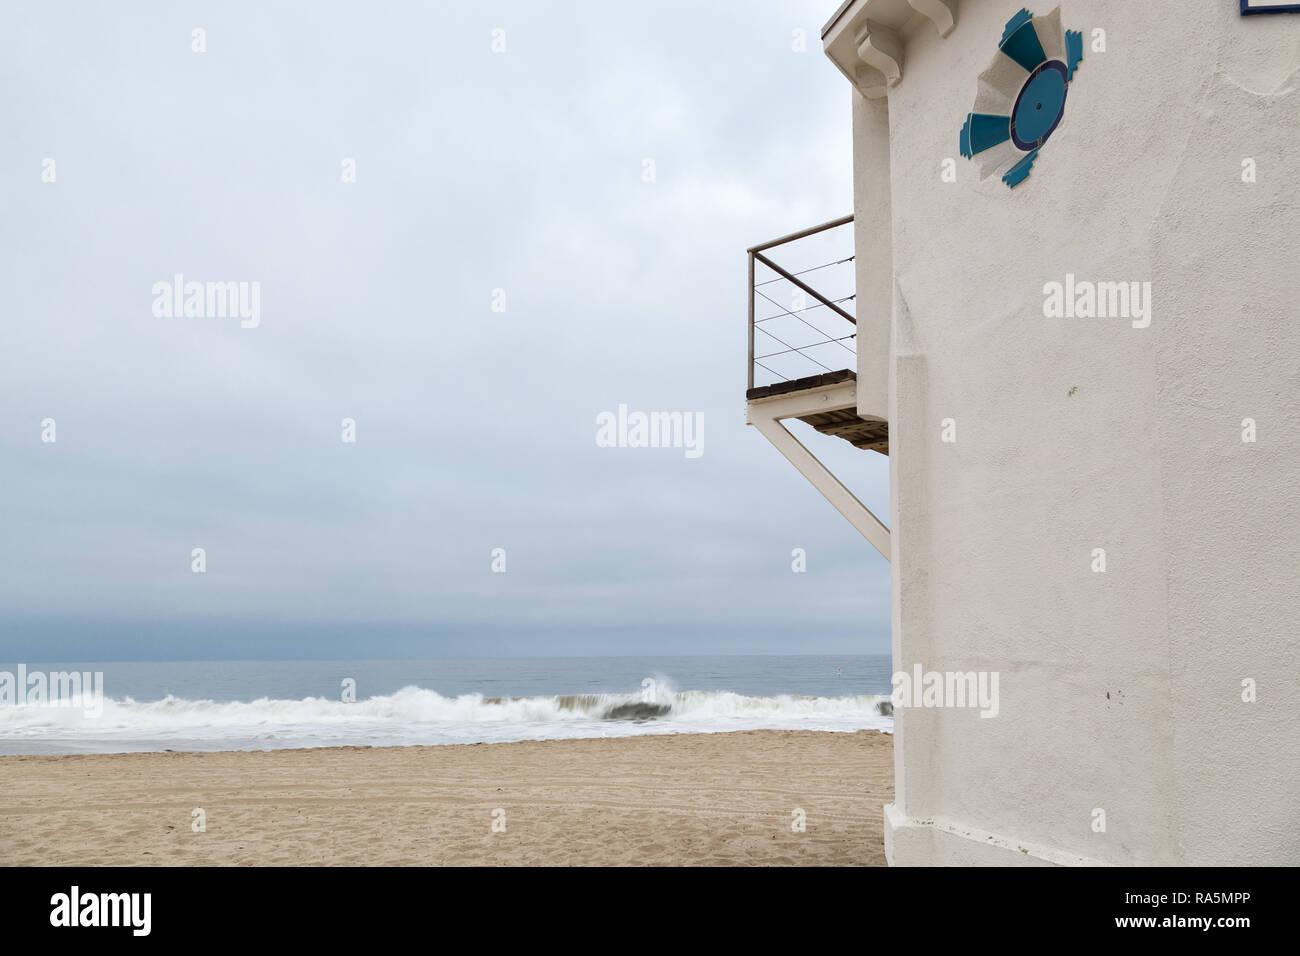 A Day in Laguna Beach, California Stock Photo